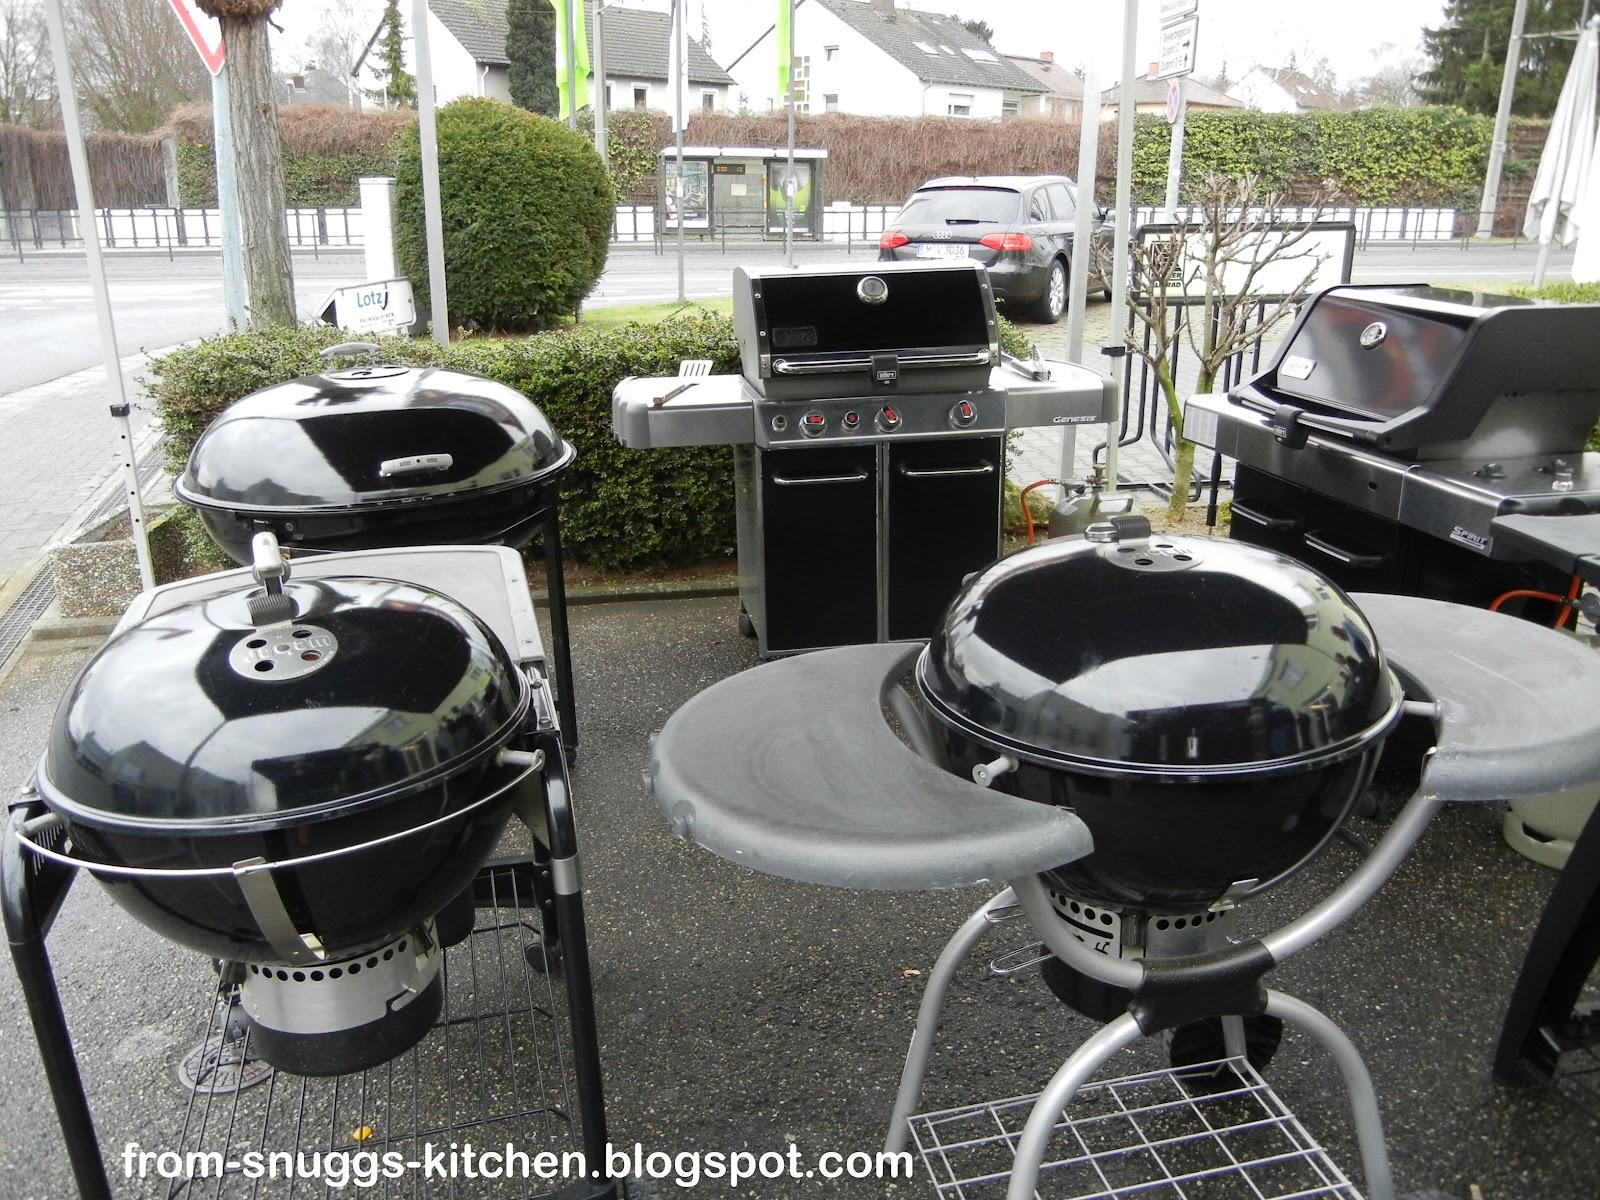 weber grillseminar 2012 from snuggs kitchen. Black Bedroom Furniture Sets. Home Design Ideas